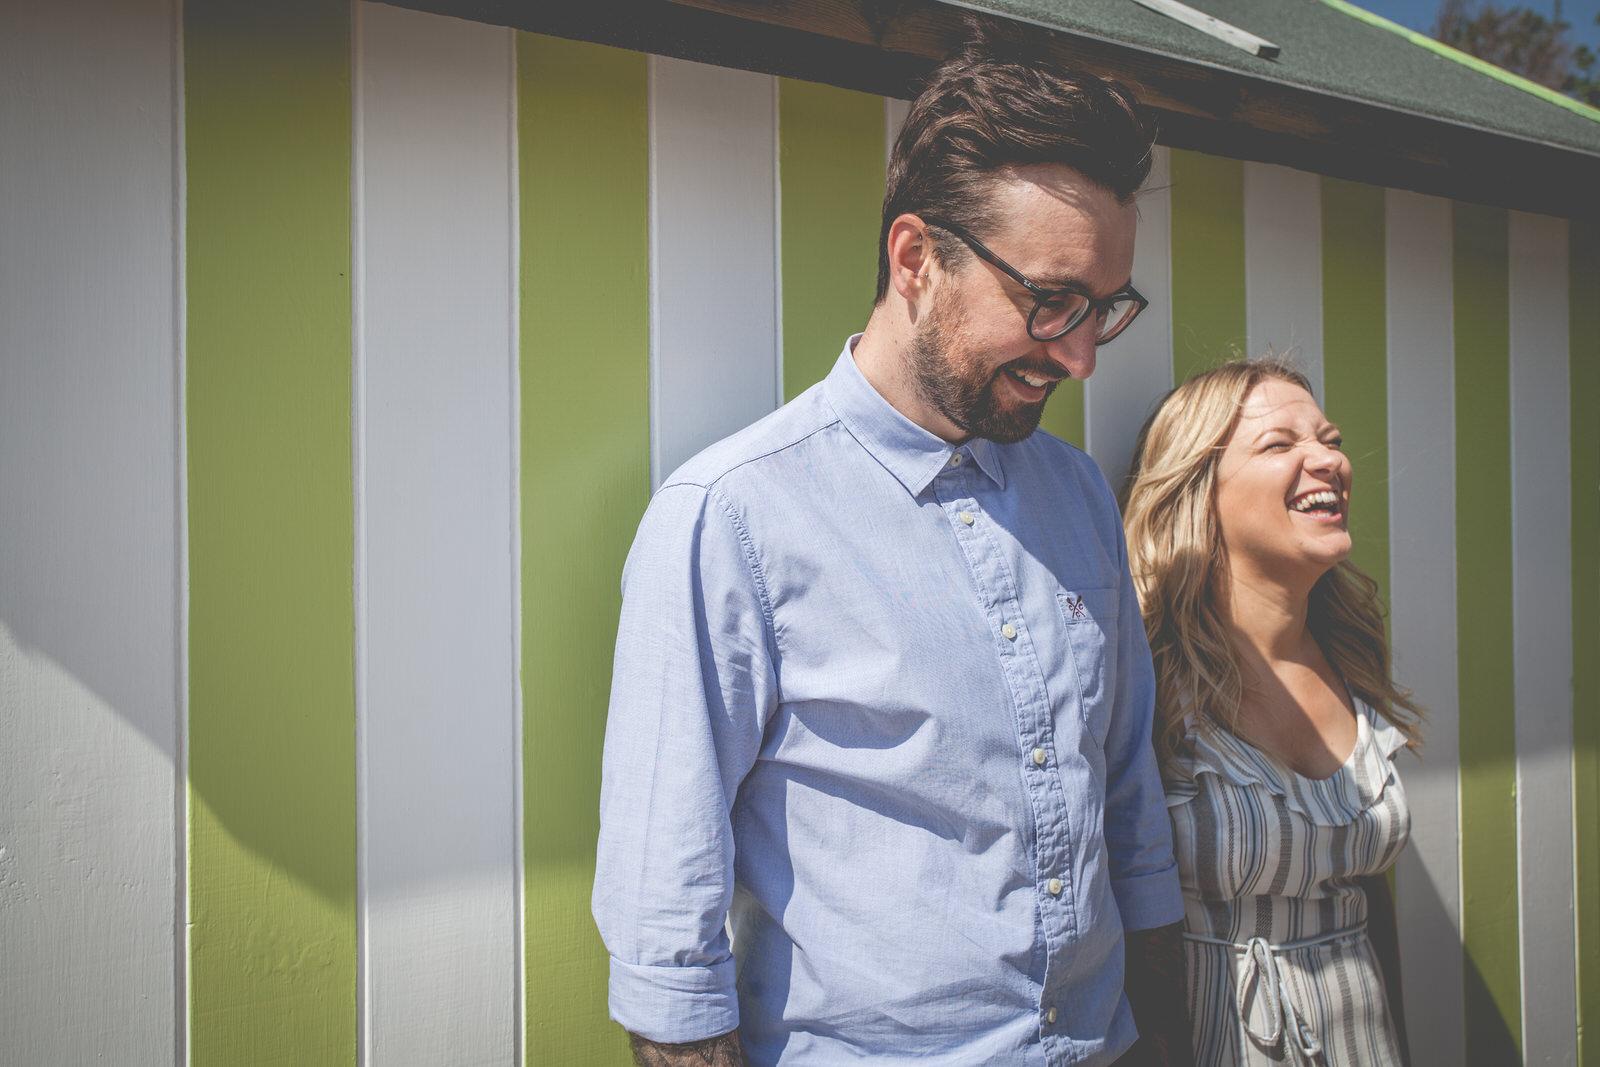 Felixstowe Beachfront Engagement - Sinead  Ryan - 032.jpg